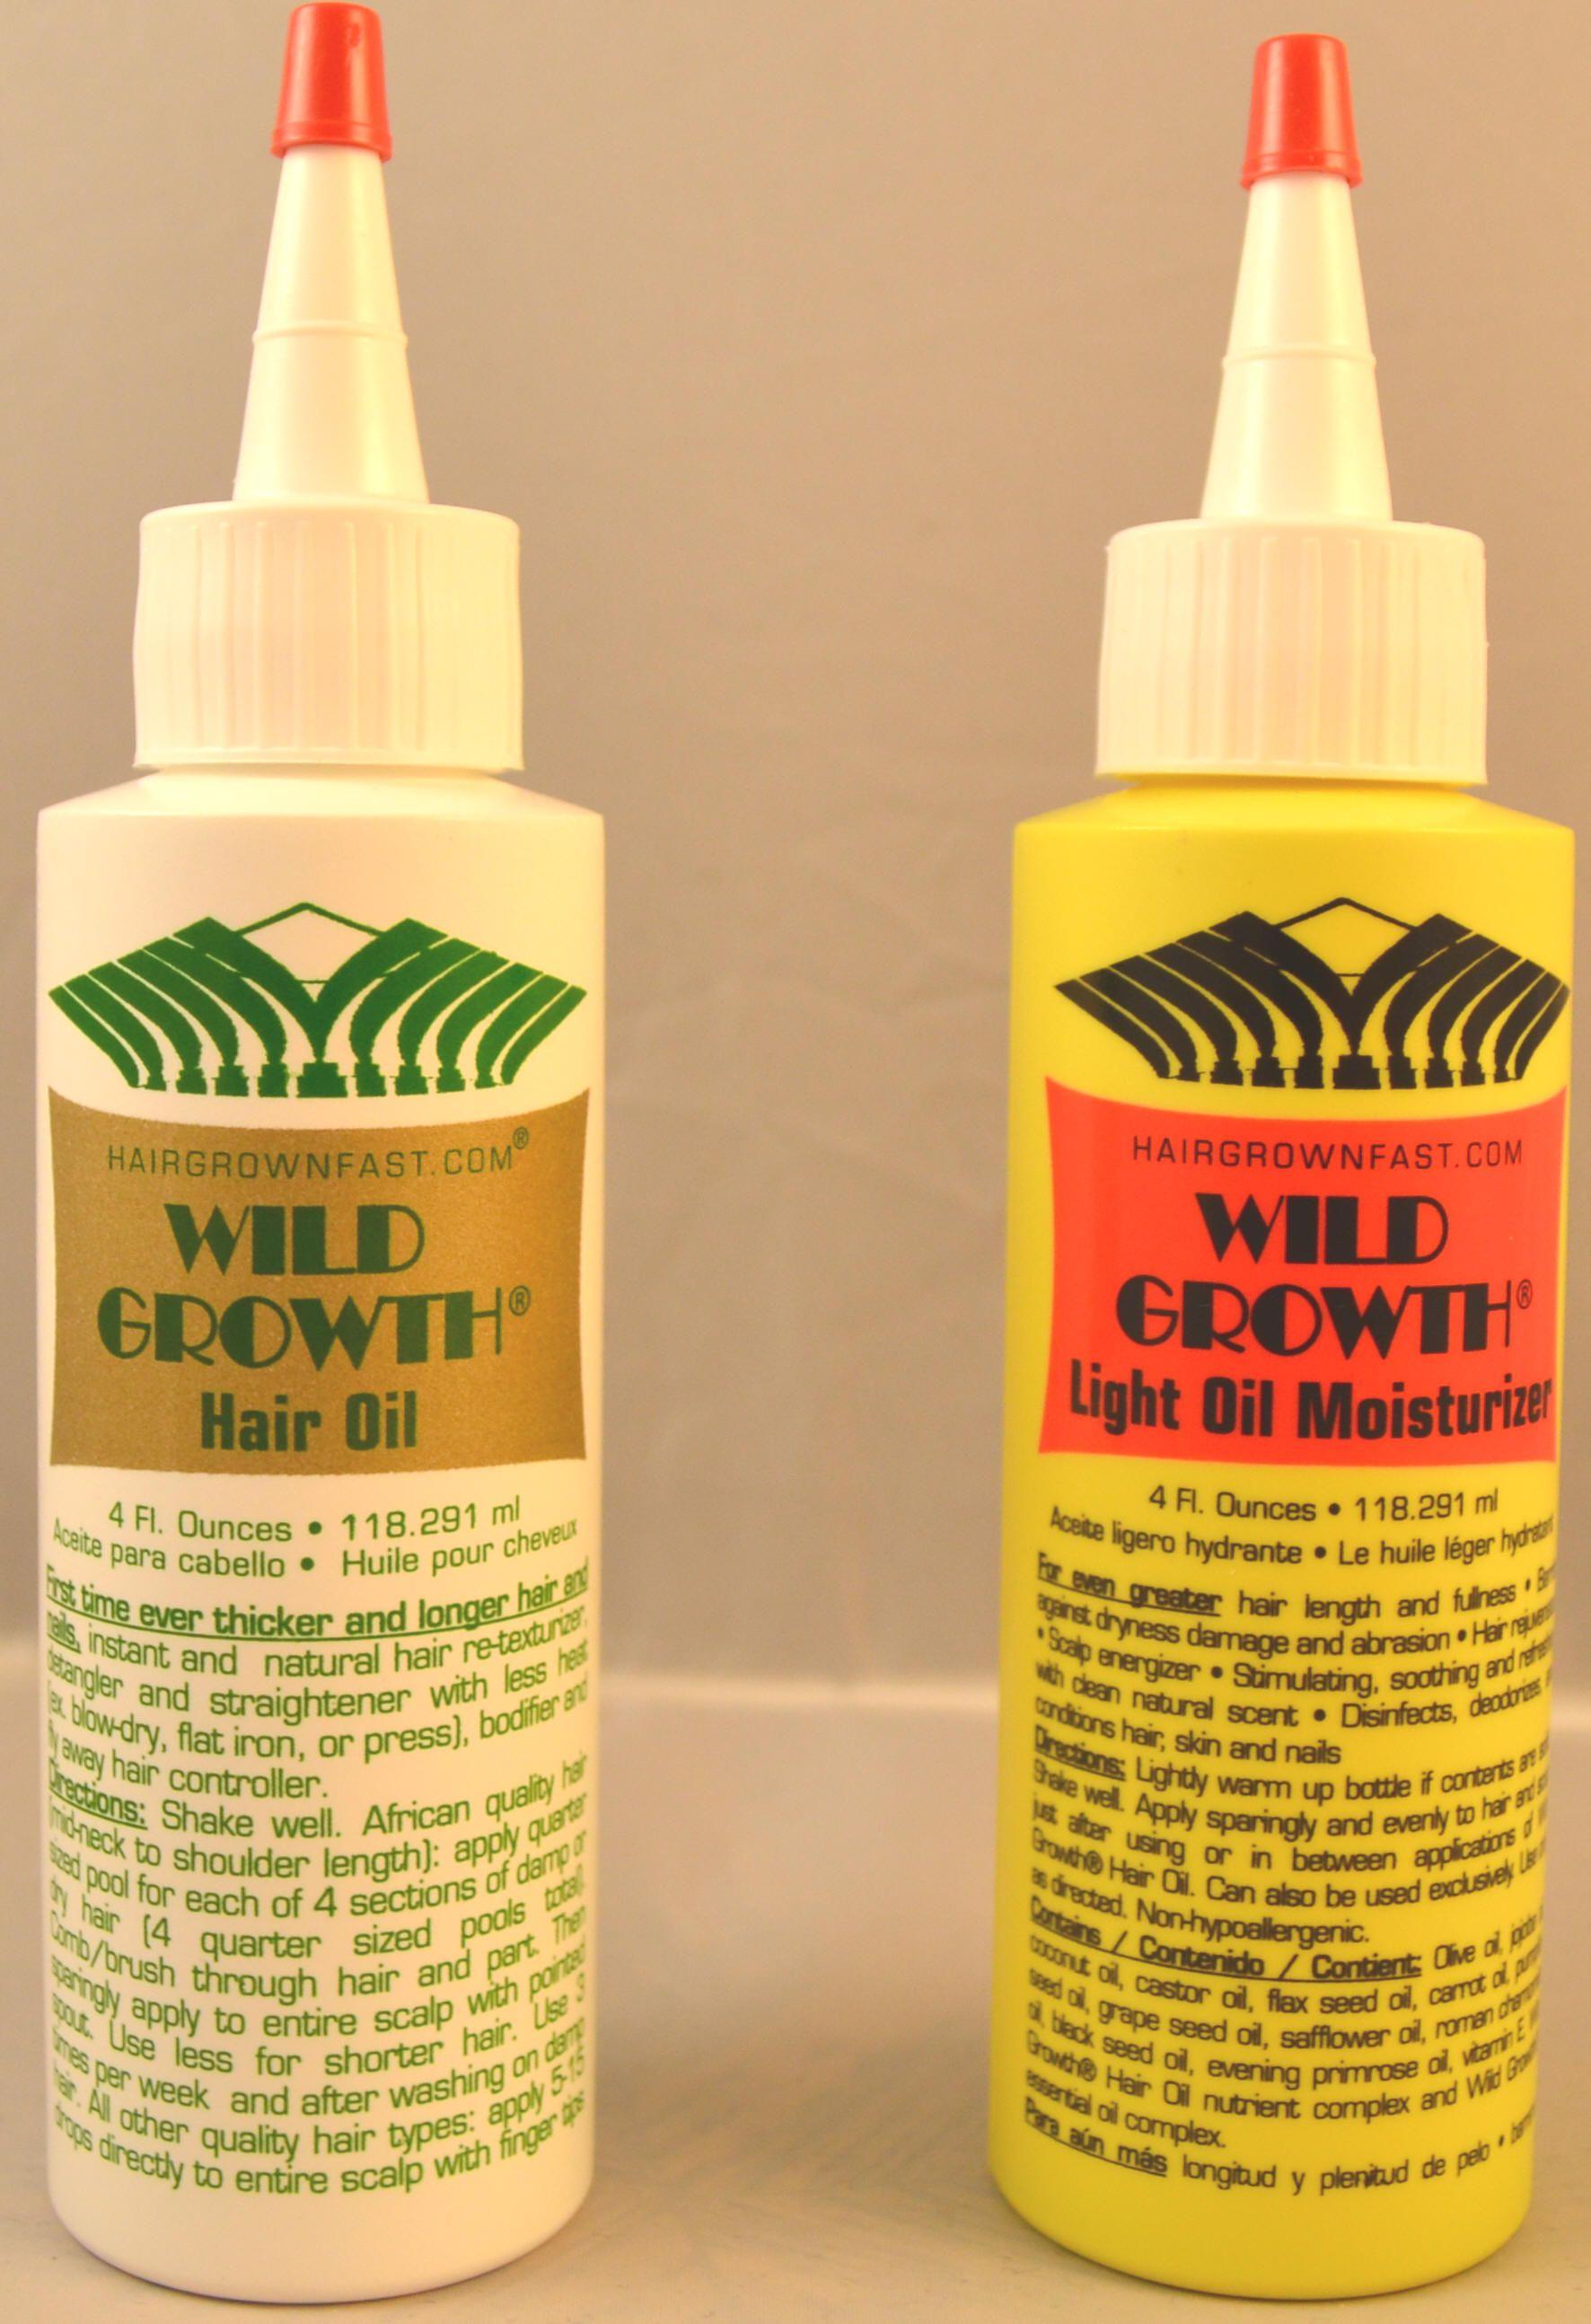 Wild Growth Wild growth hair oil, Hair oil, Wild growth